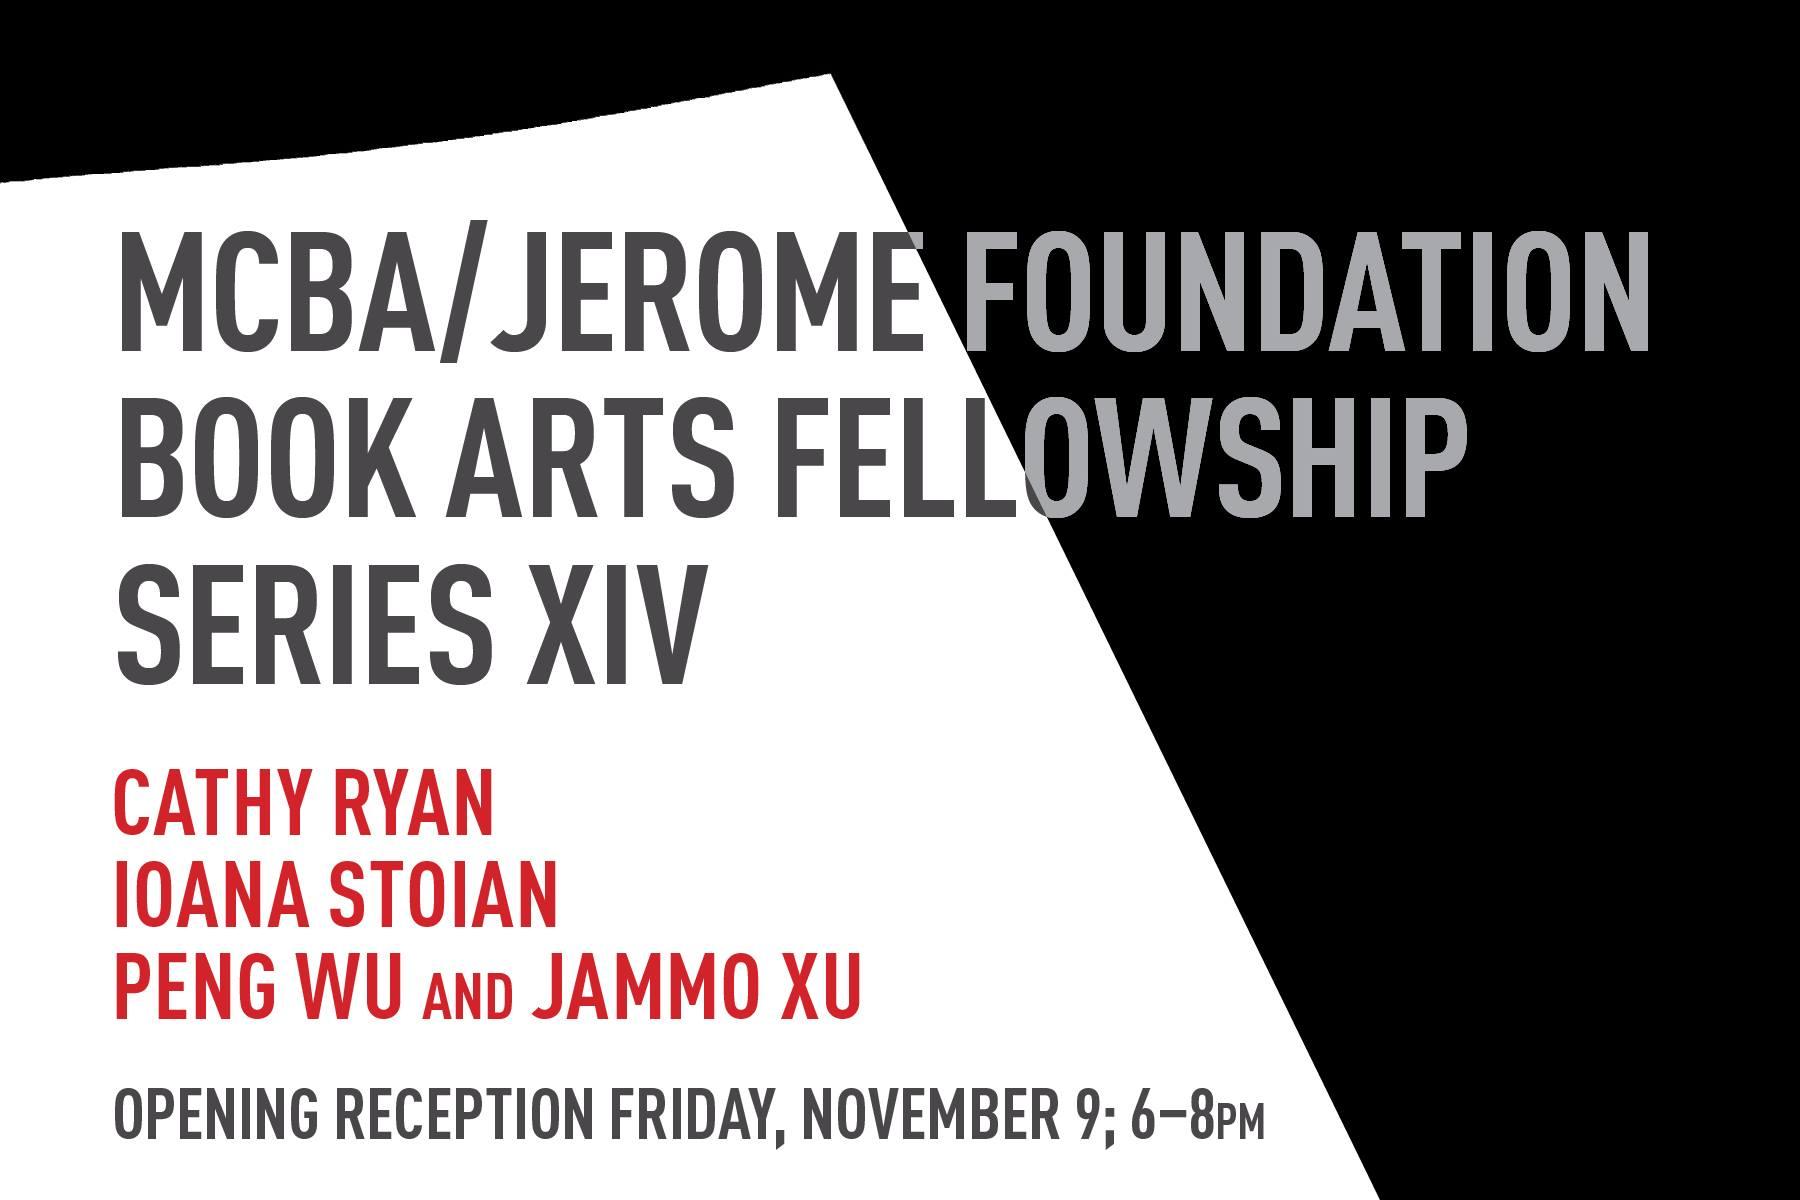 November 9, 2018, Friday - Opening Reception: MCBA/Jerome